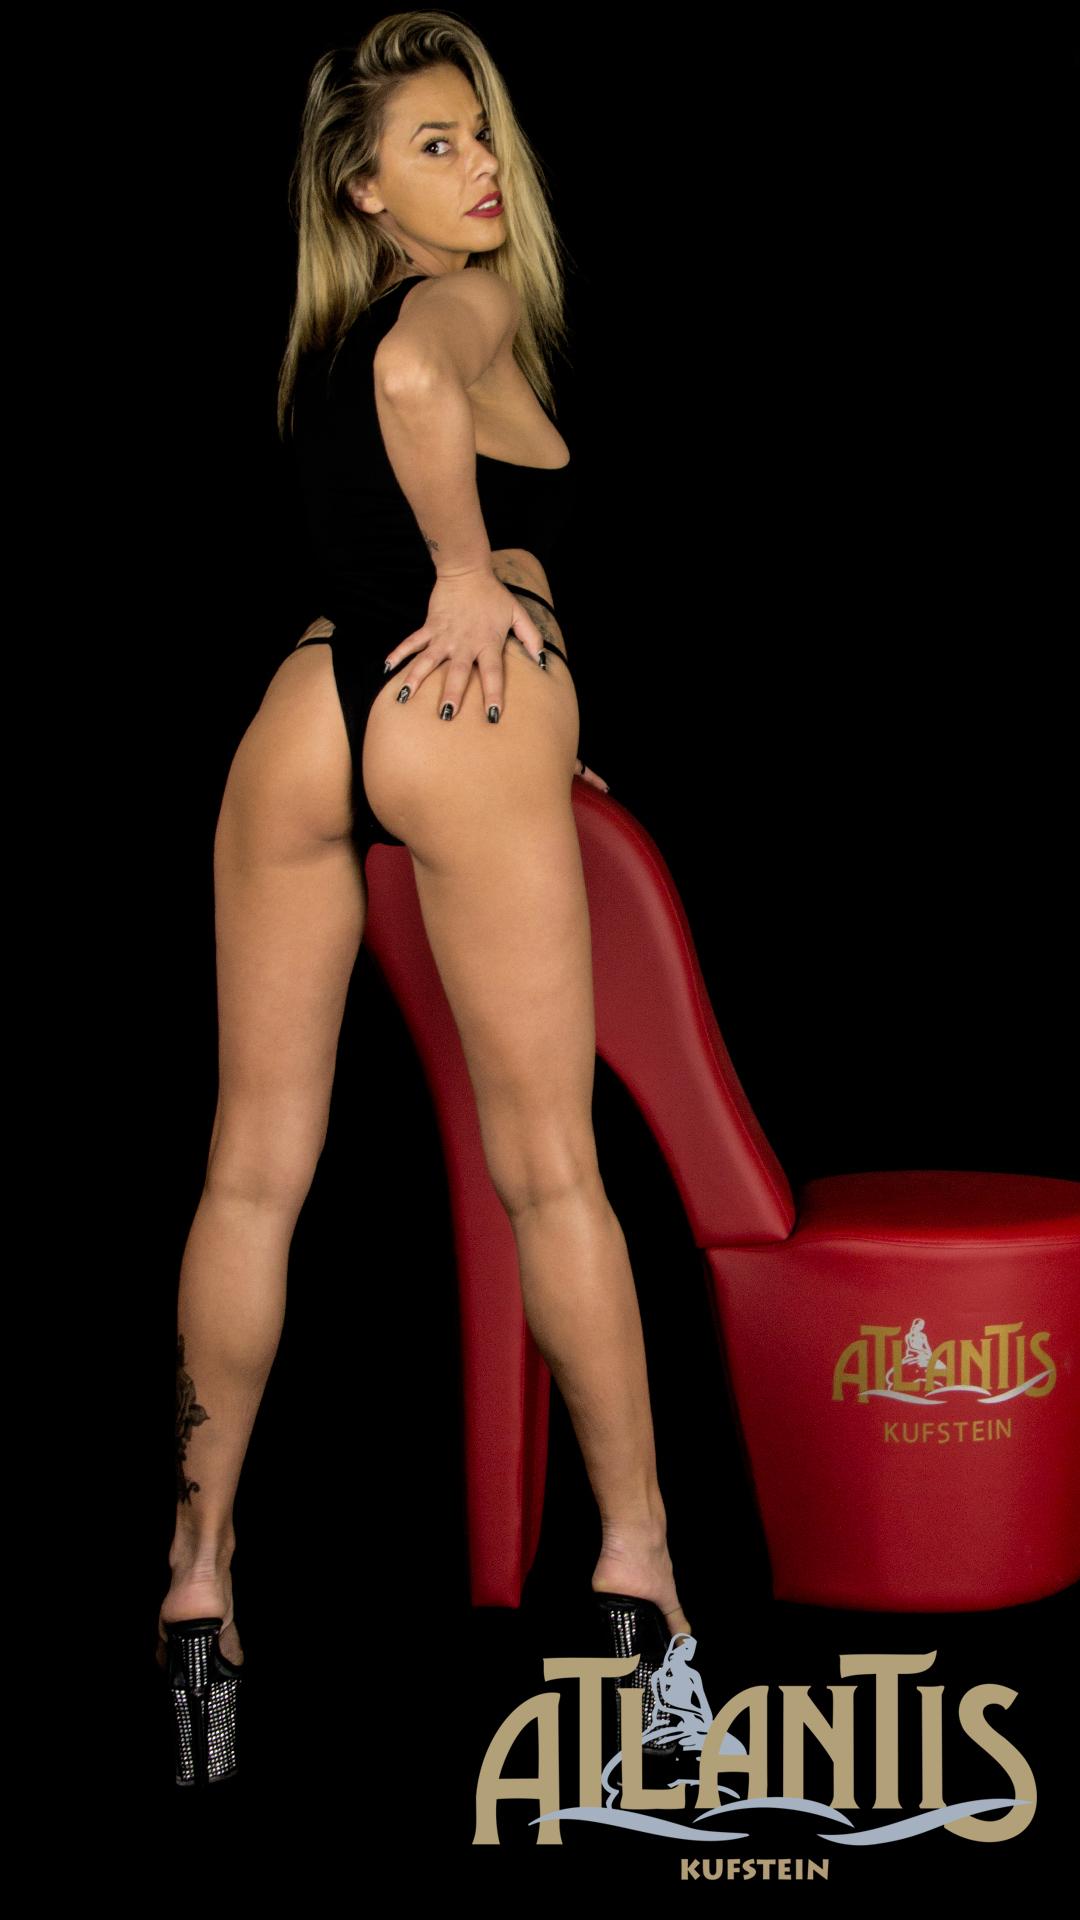 Ana die schlanke Atlantis Lady